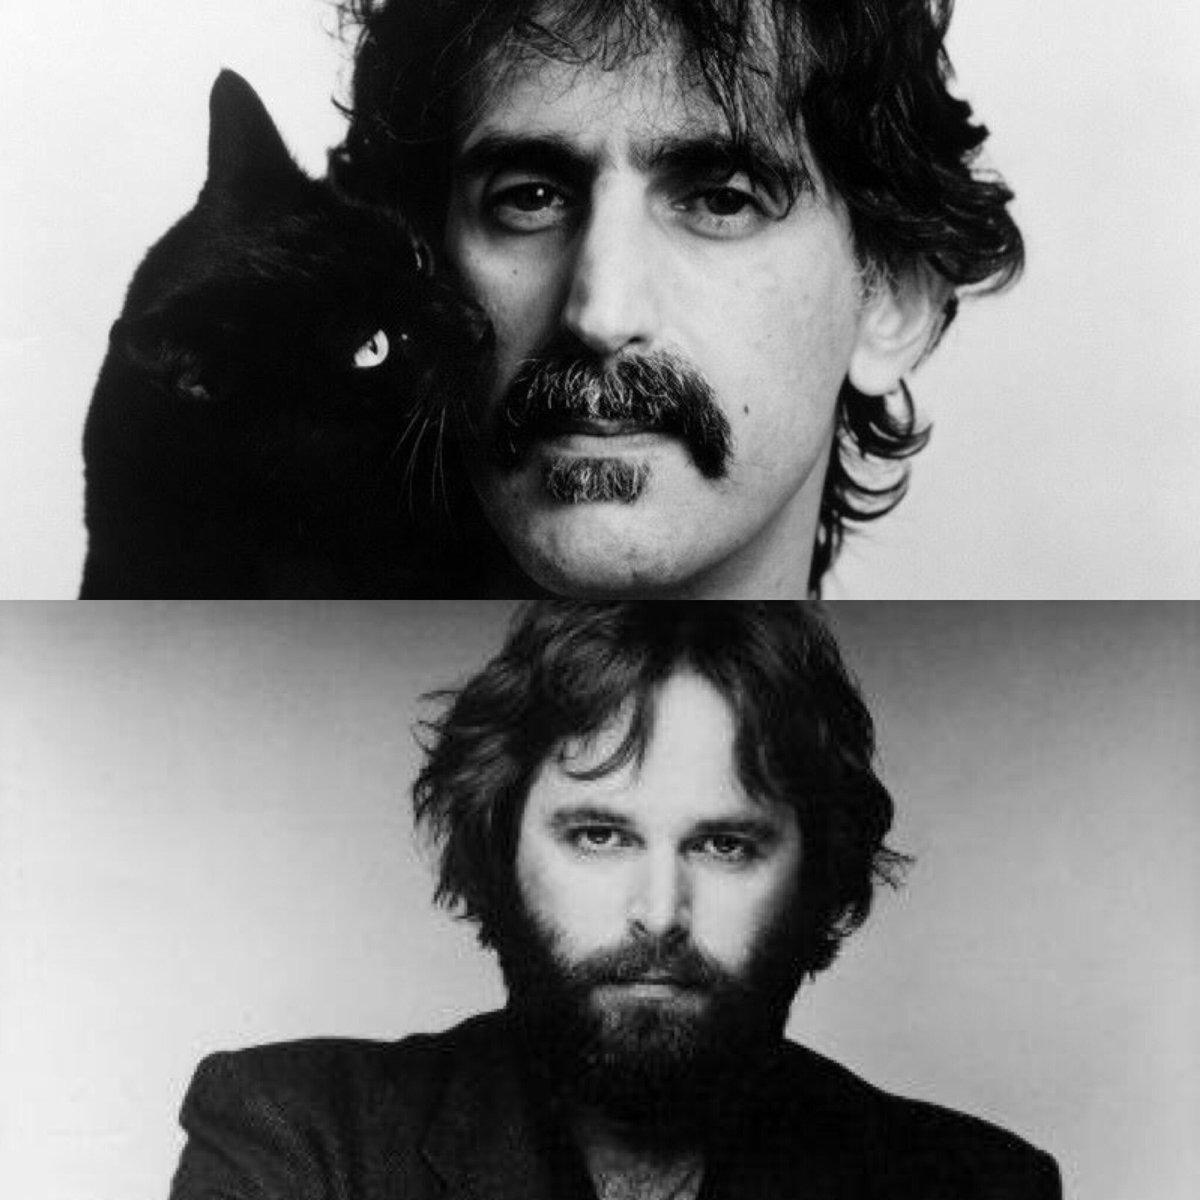 "Frank Zappa Happy Birthday with regard to ben lorentzen on twitter: ""happy birthday frank zappa & carl"